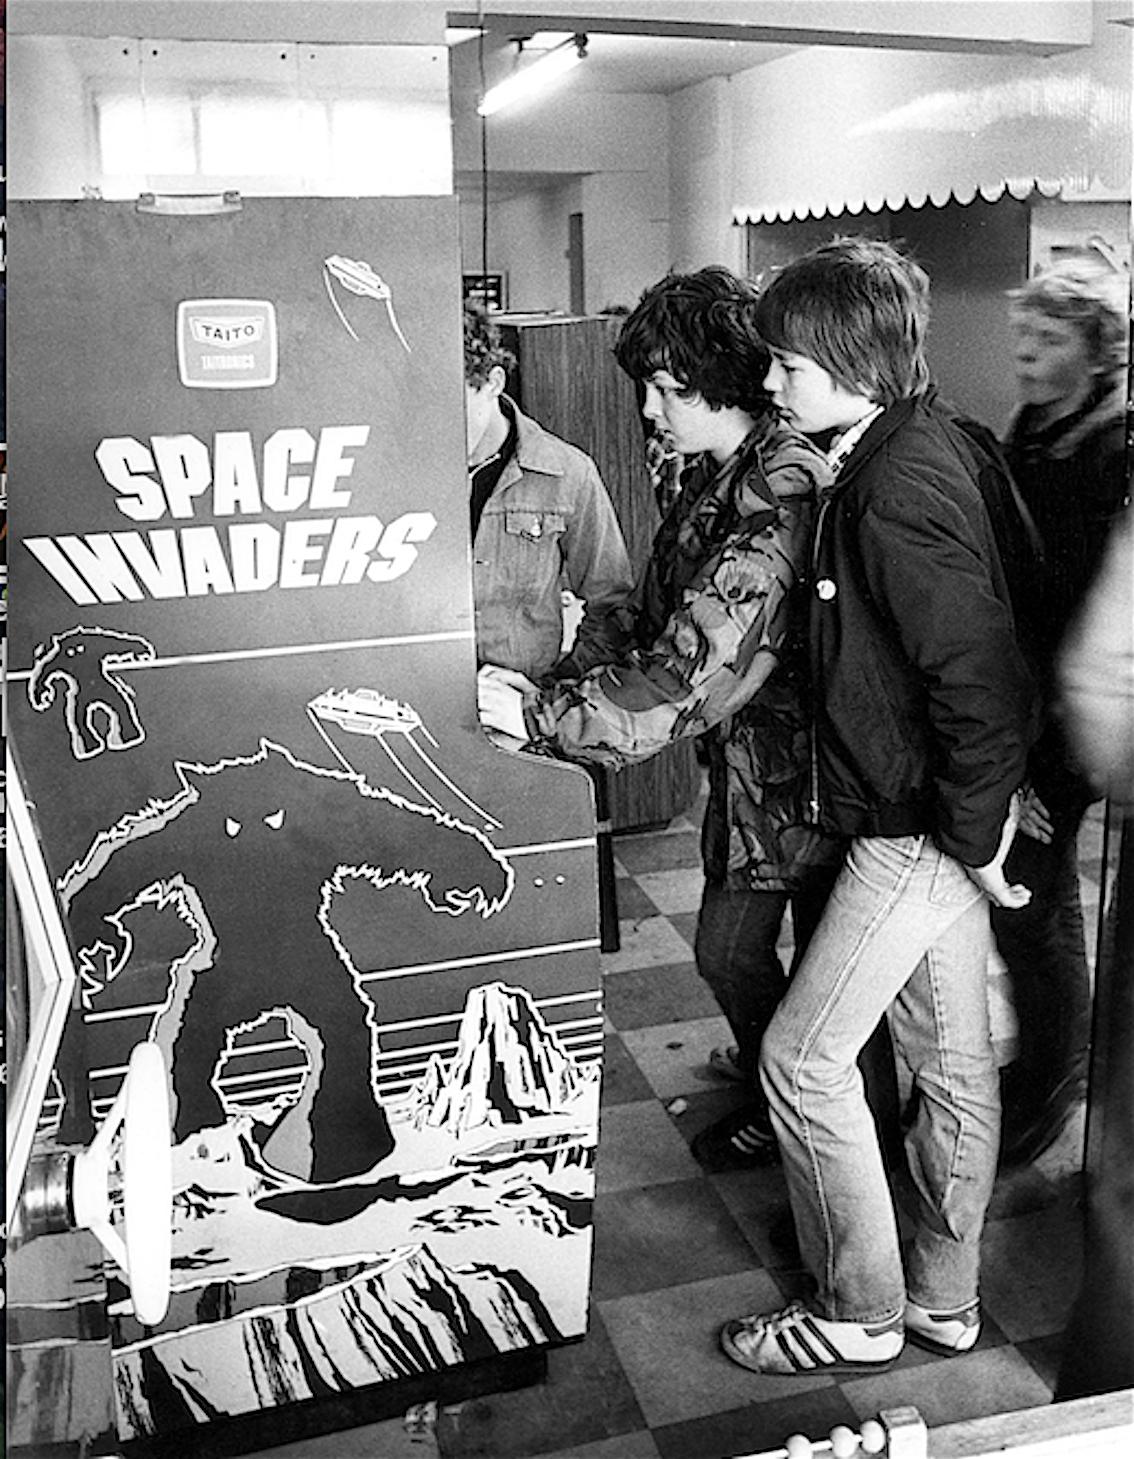 sapce_invaders_sala_giochi_arcade_anni_70_80